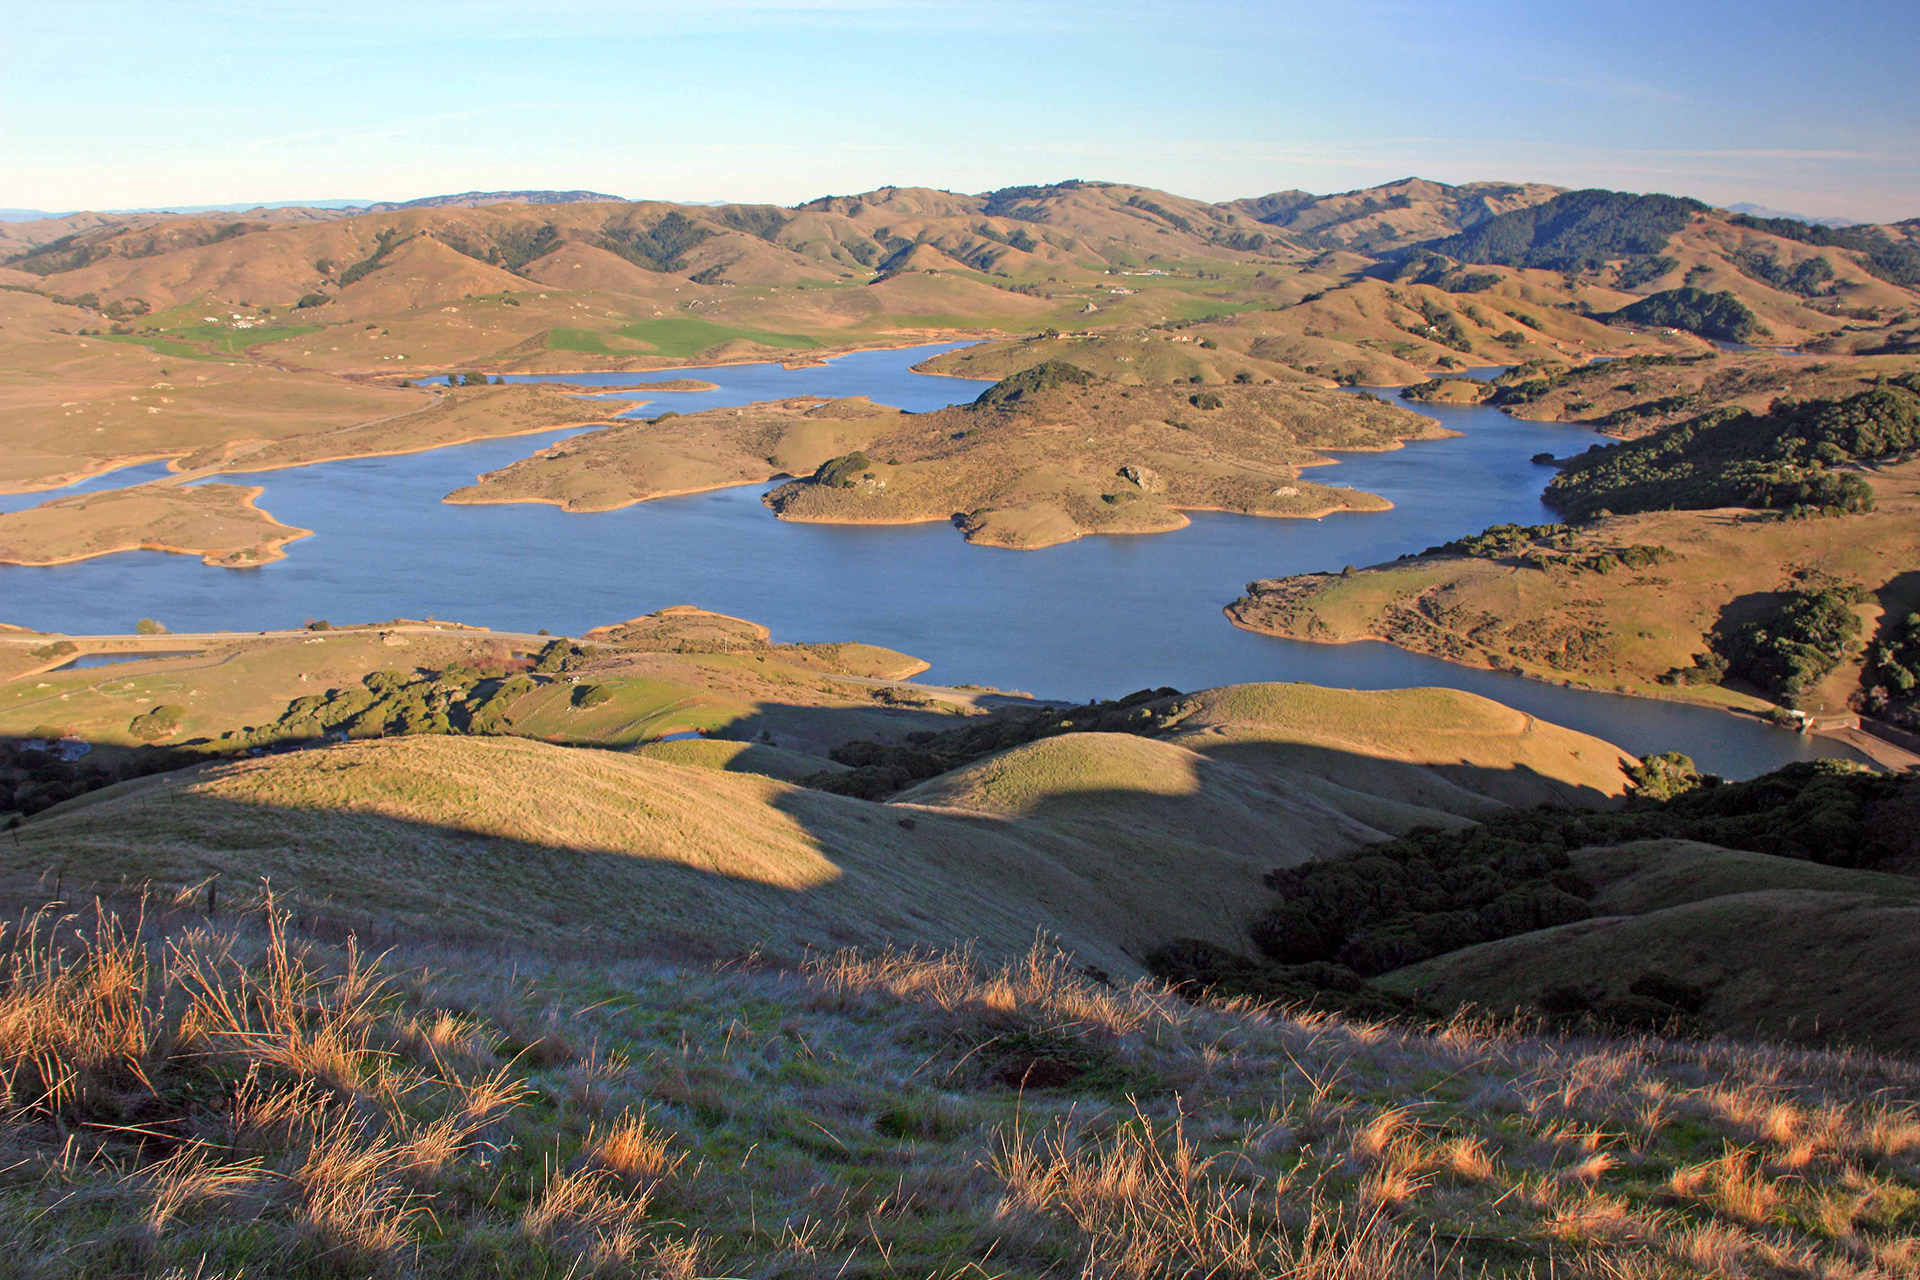 Nicasio Reservoir - Marin County, CA